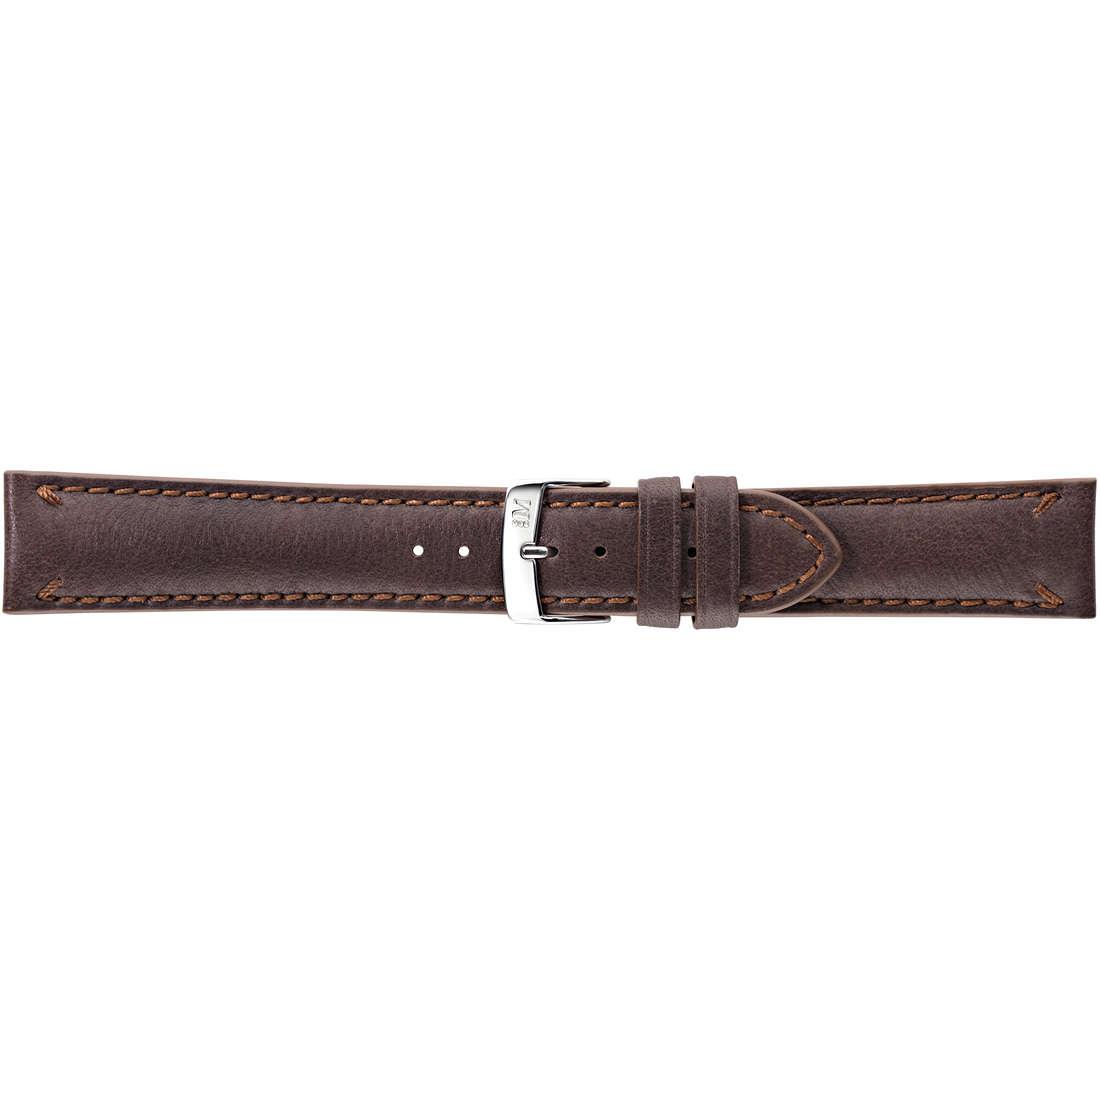 watch watch bands watch straps man Morellato Manufatti A01X4540A61030CR18